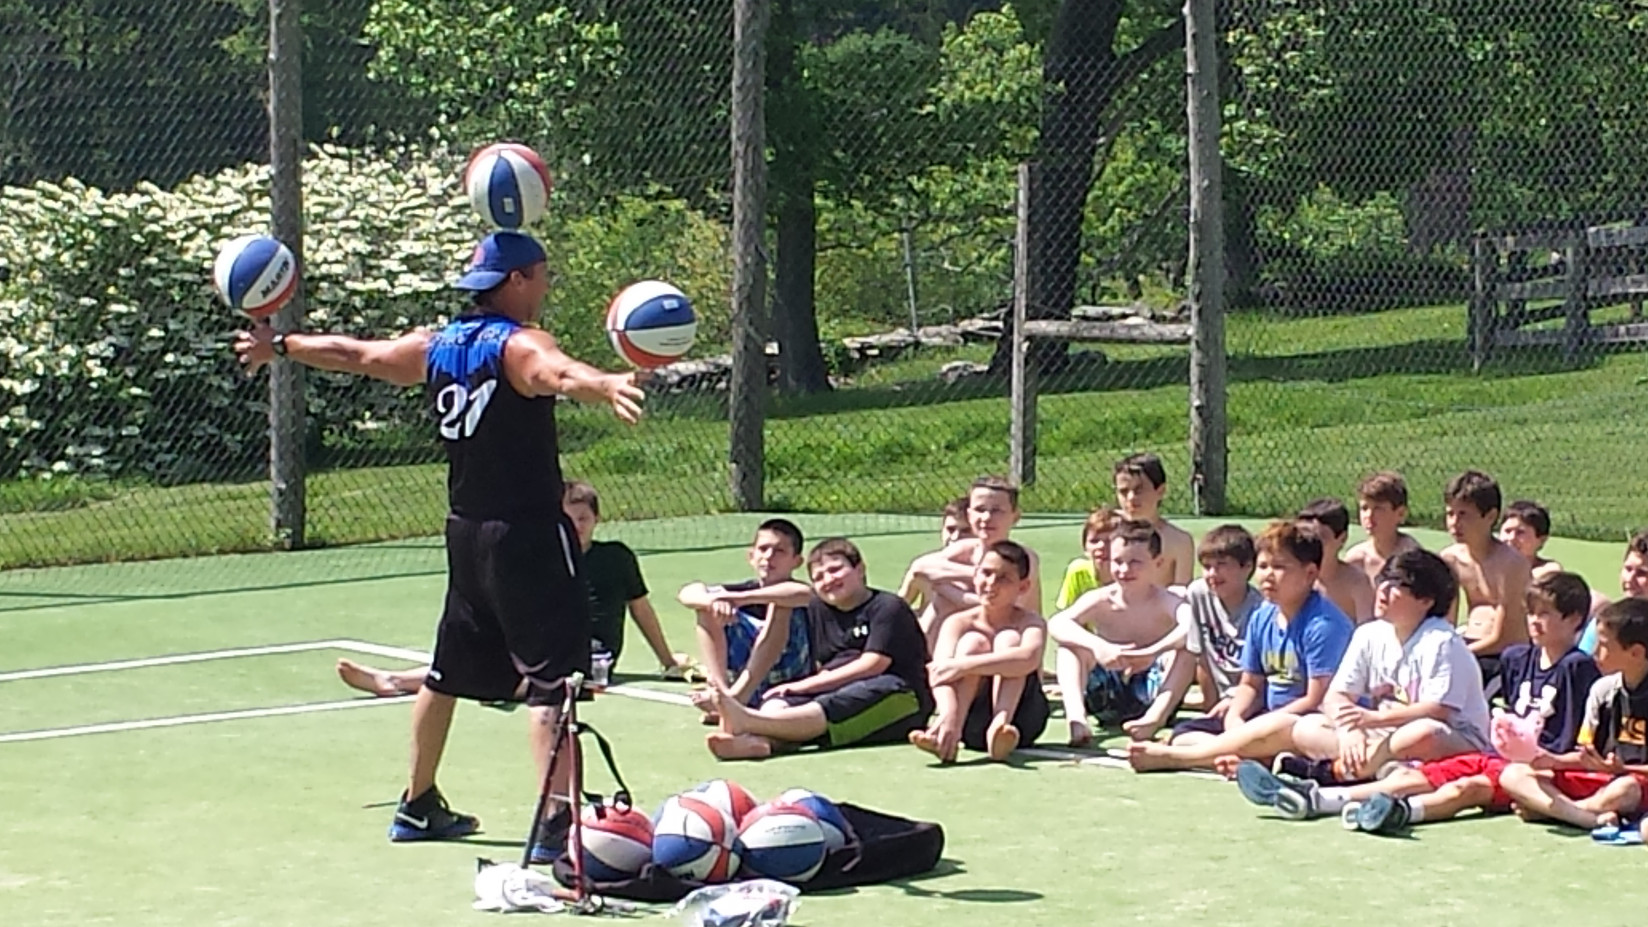 Basketball-Trick-Perfomer-For-Teens.jpg